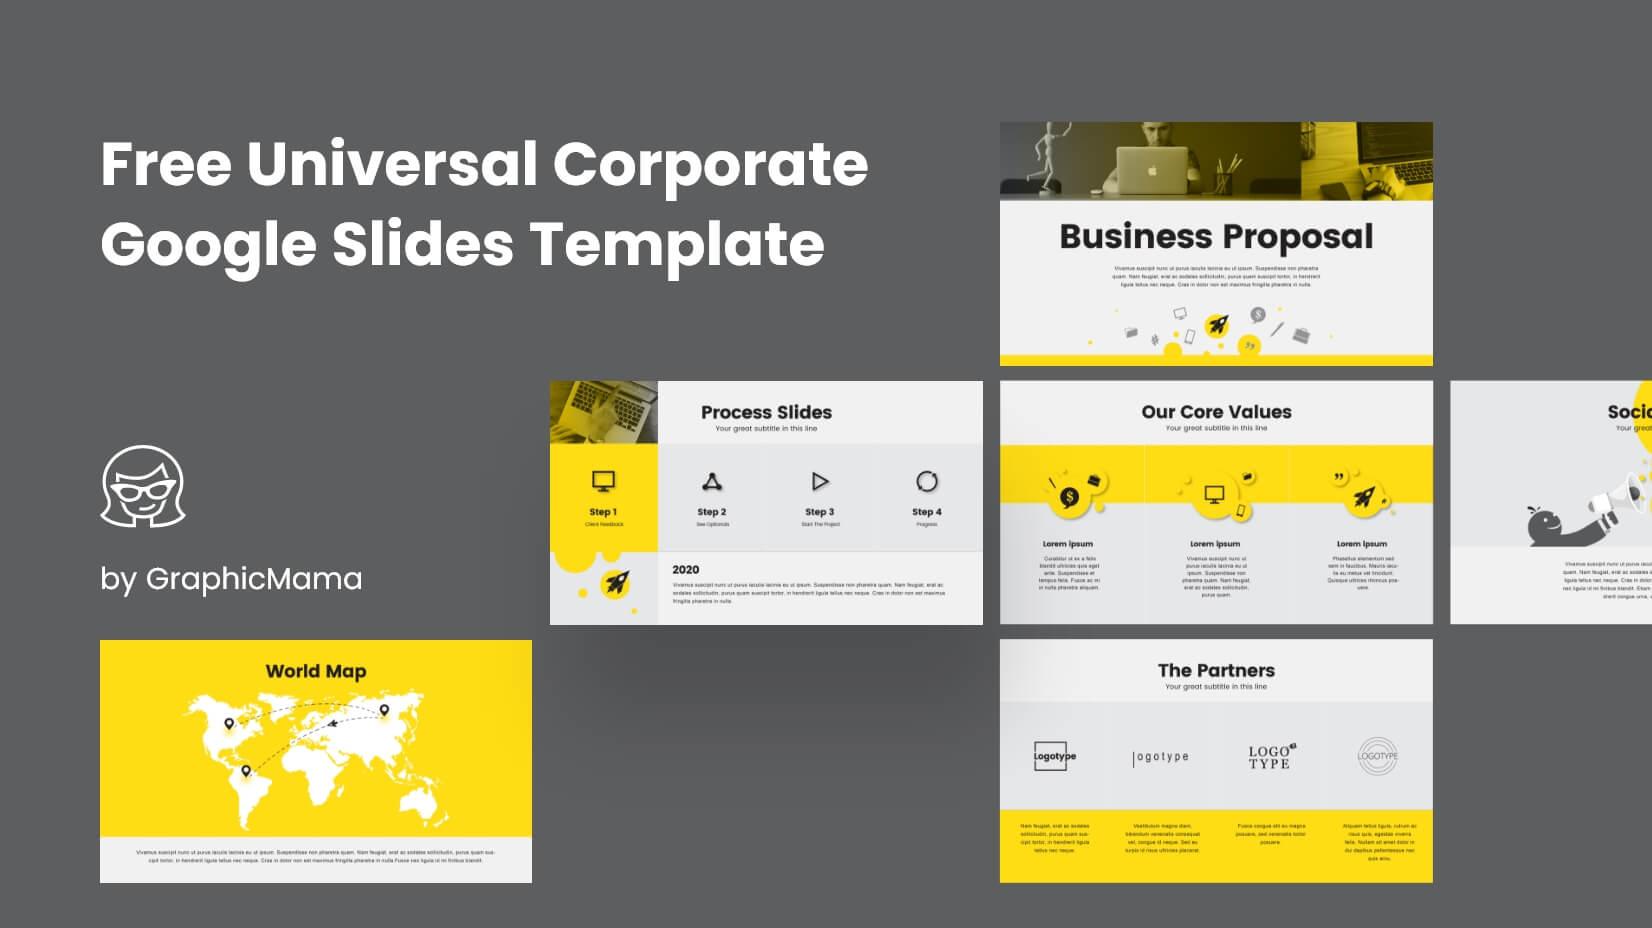 Free-Universal-Corporate-Google-Slides-Template.